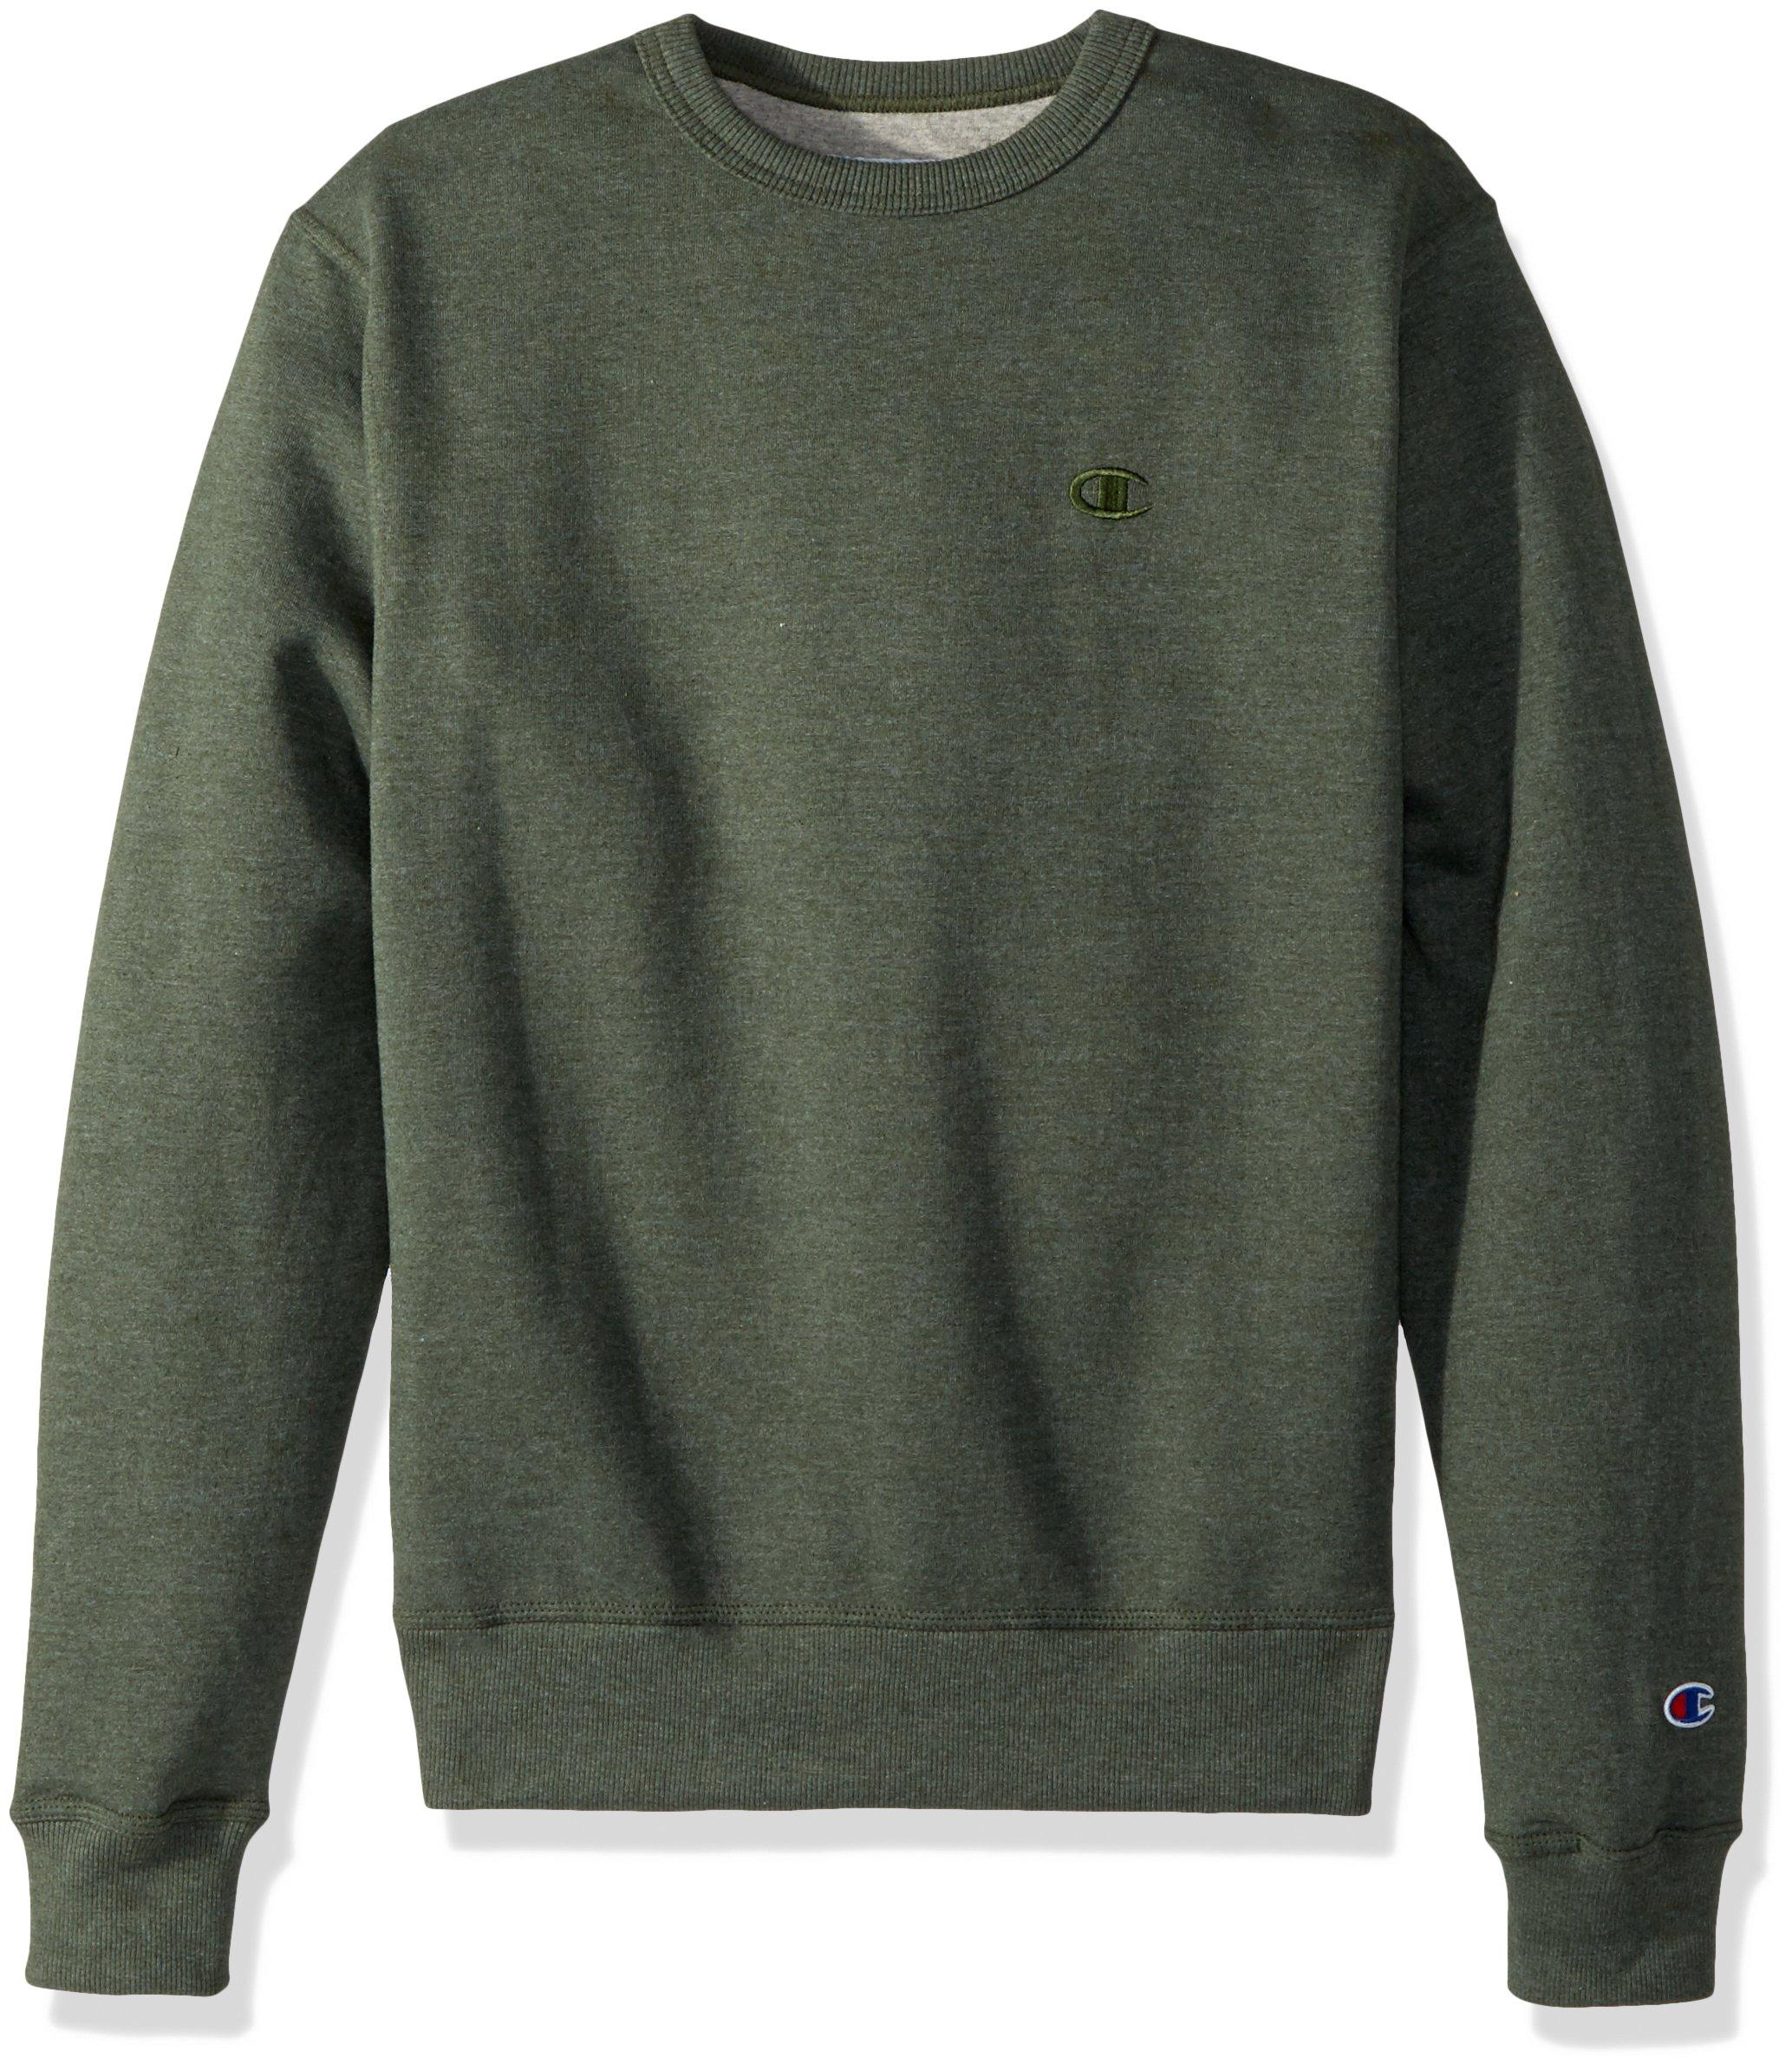 Champion Men's Powerblend Fleece Pullover Sweatshirt, Forest Grove Heather, Medium